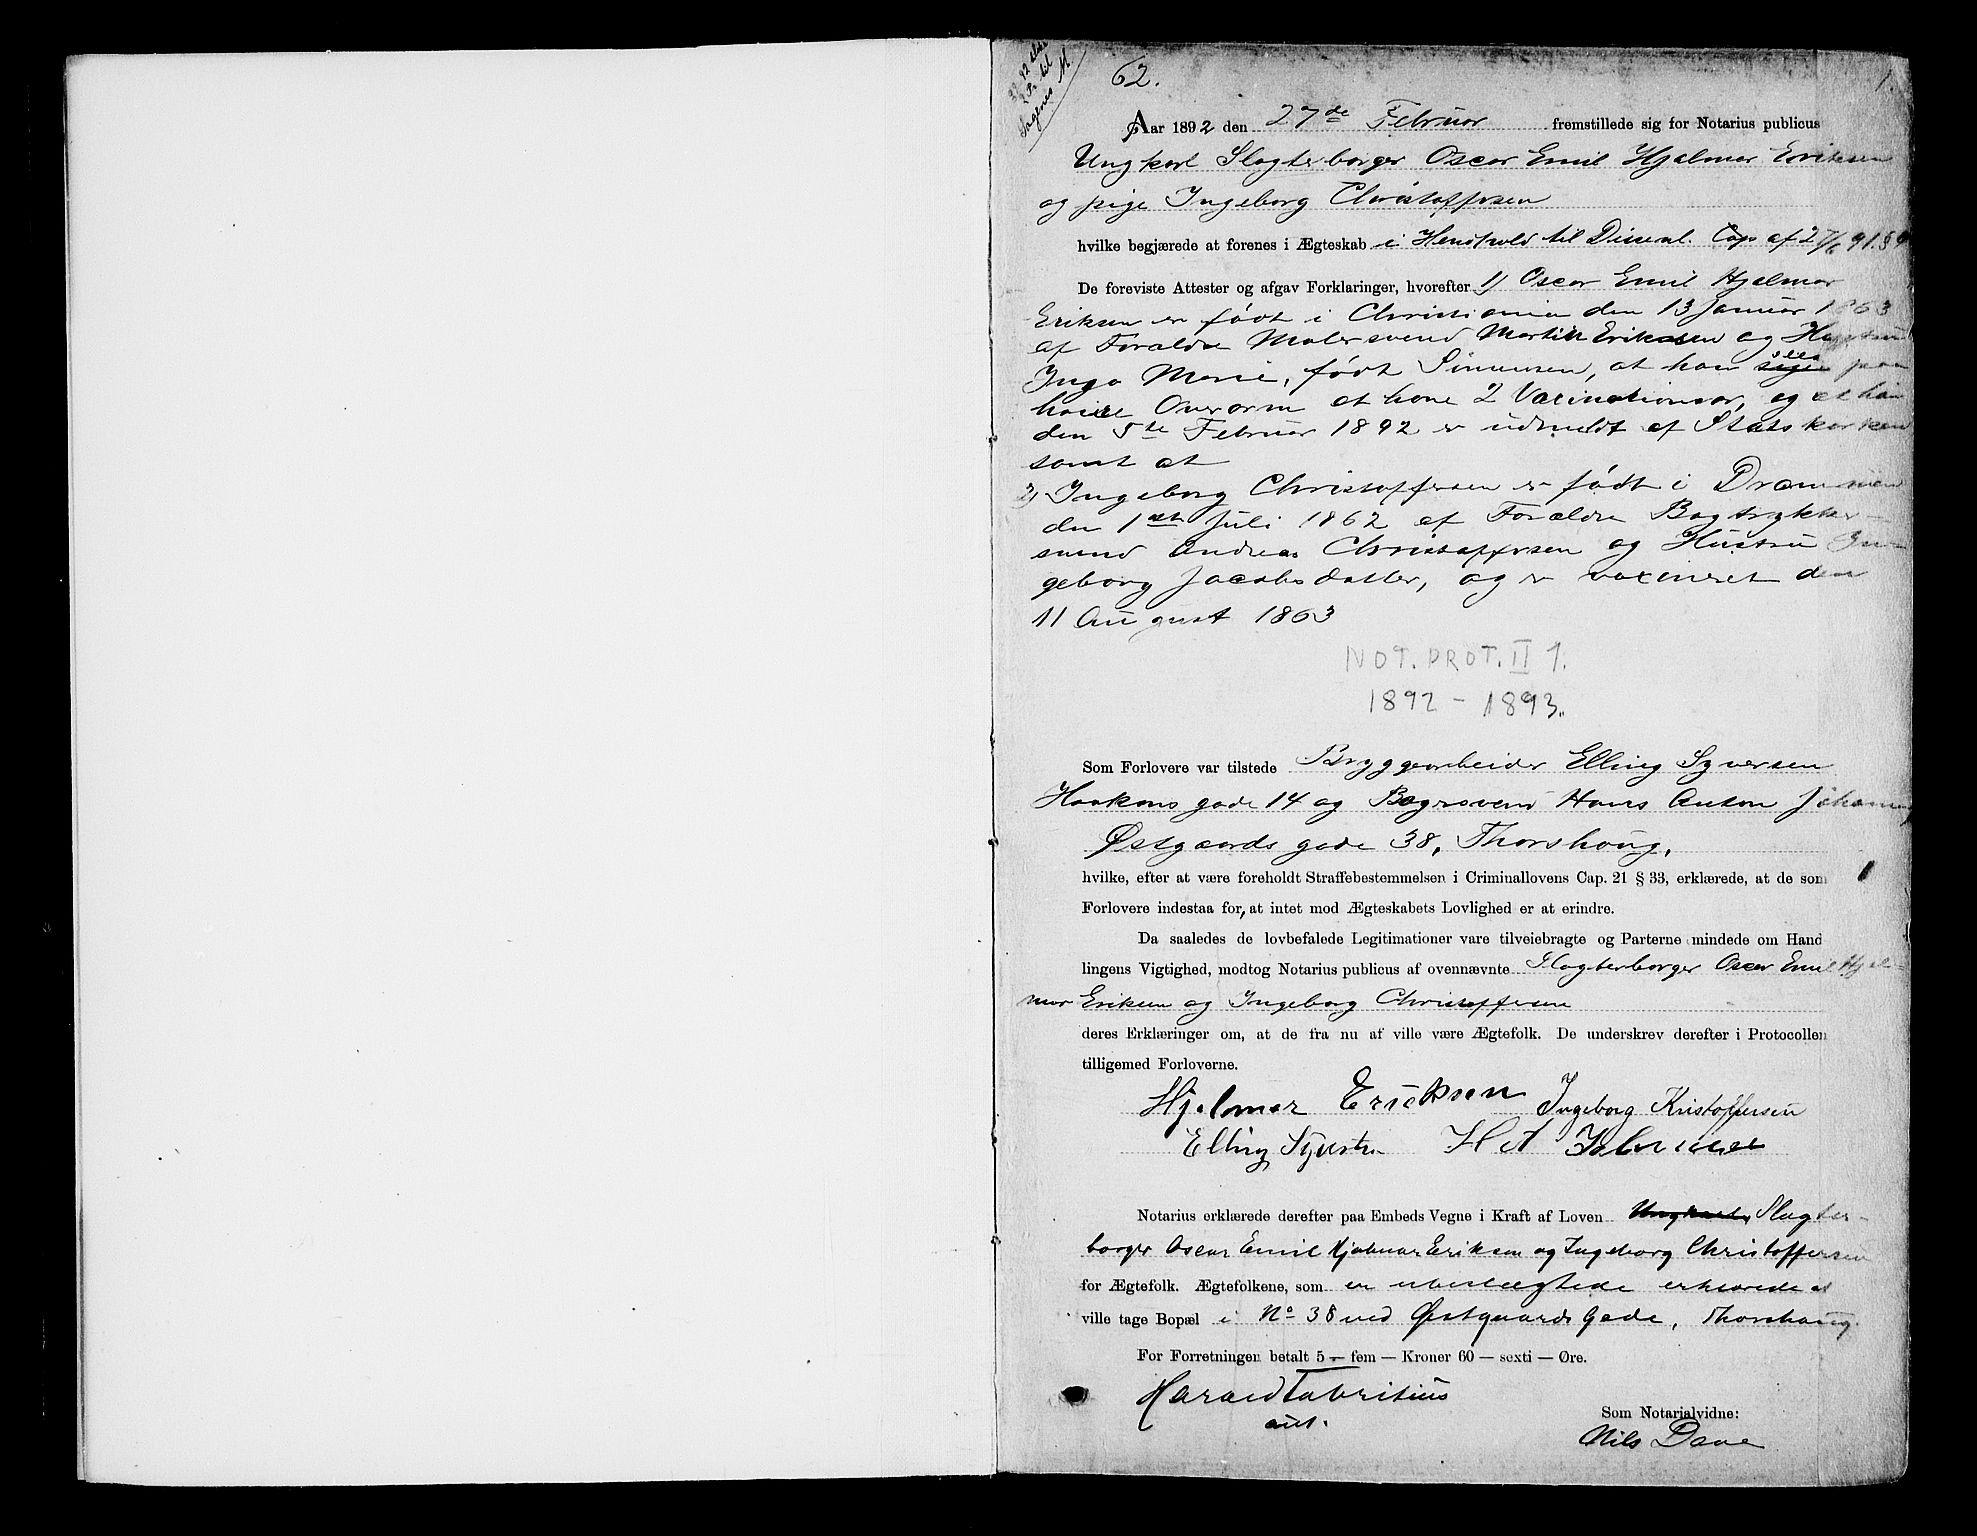 SAO, Oslo byfogd avd. I, L/Lb/Lbb/L0001: Notarialprotokoll, rekke II: Vigsler, 1892-1893, s. 1a